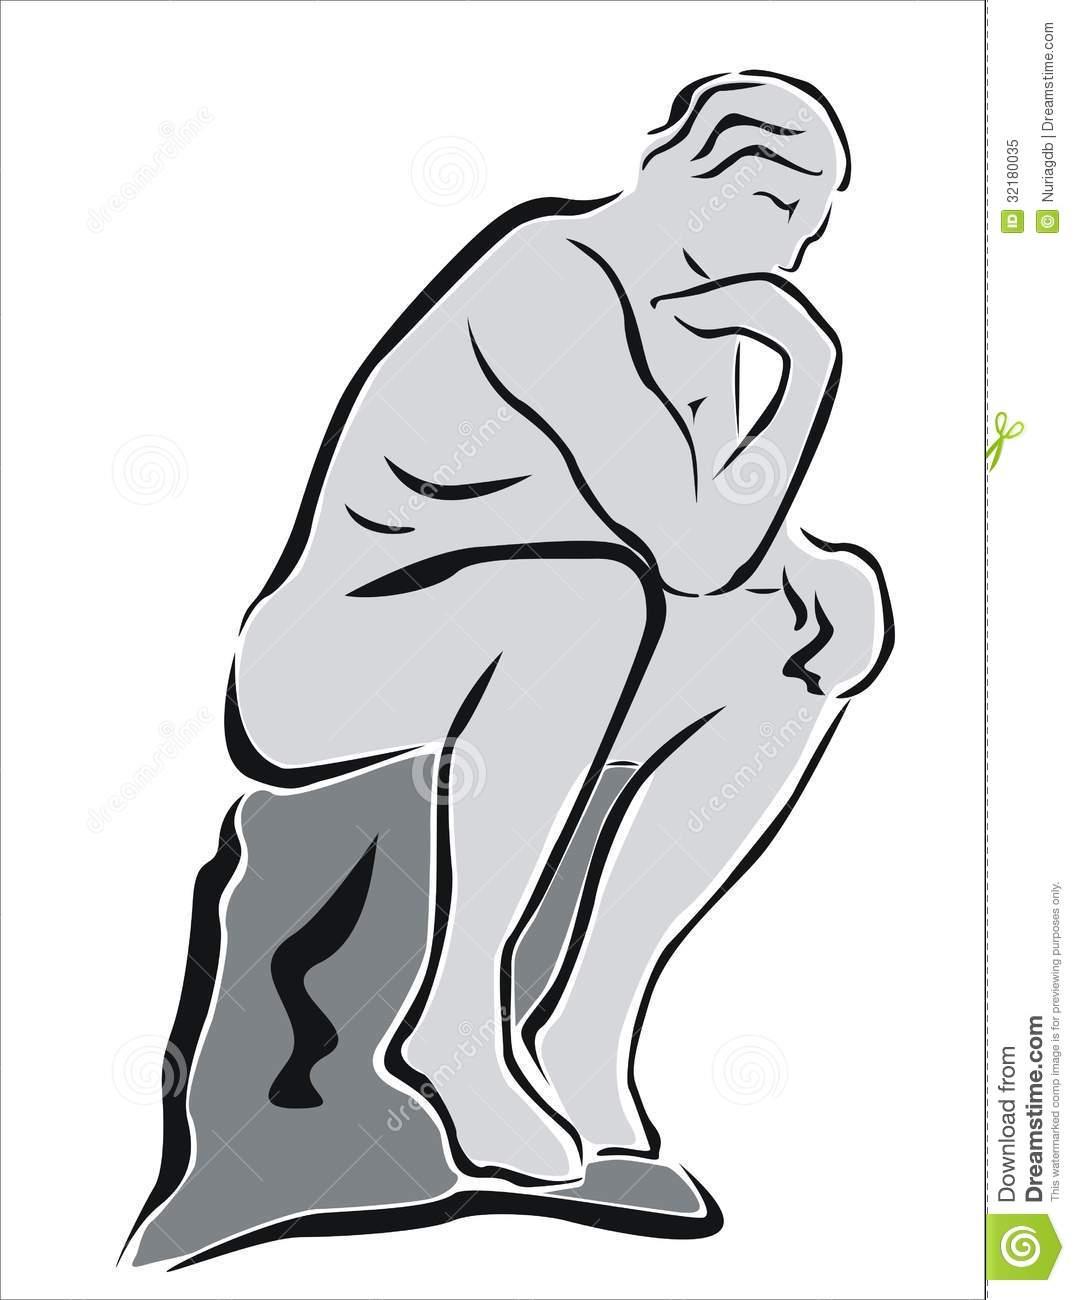 Thinking man sculpture clipart.